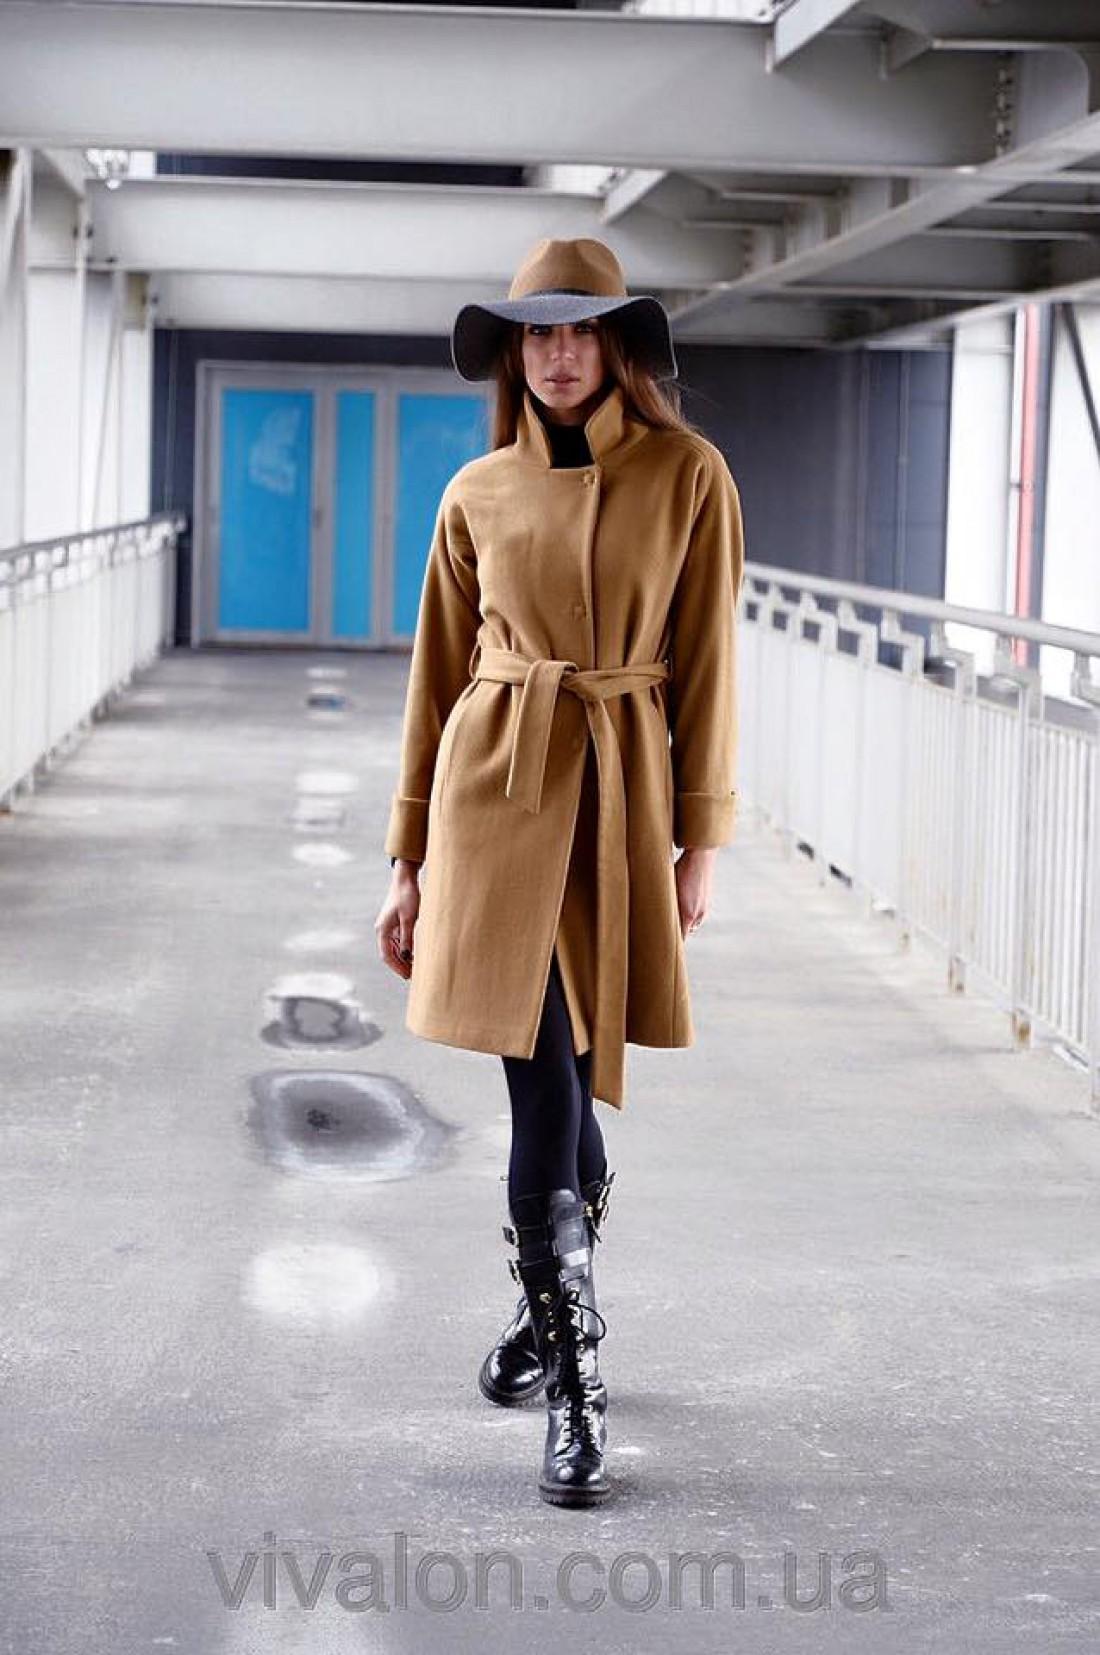 Пальто на пояске